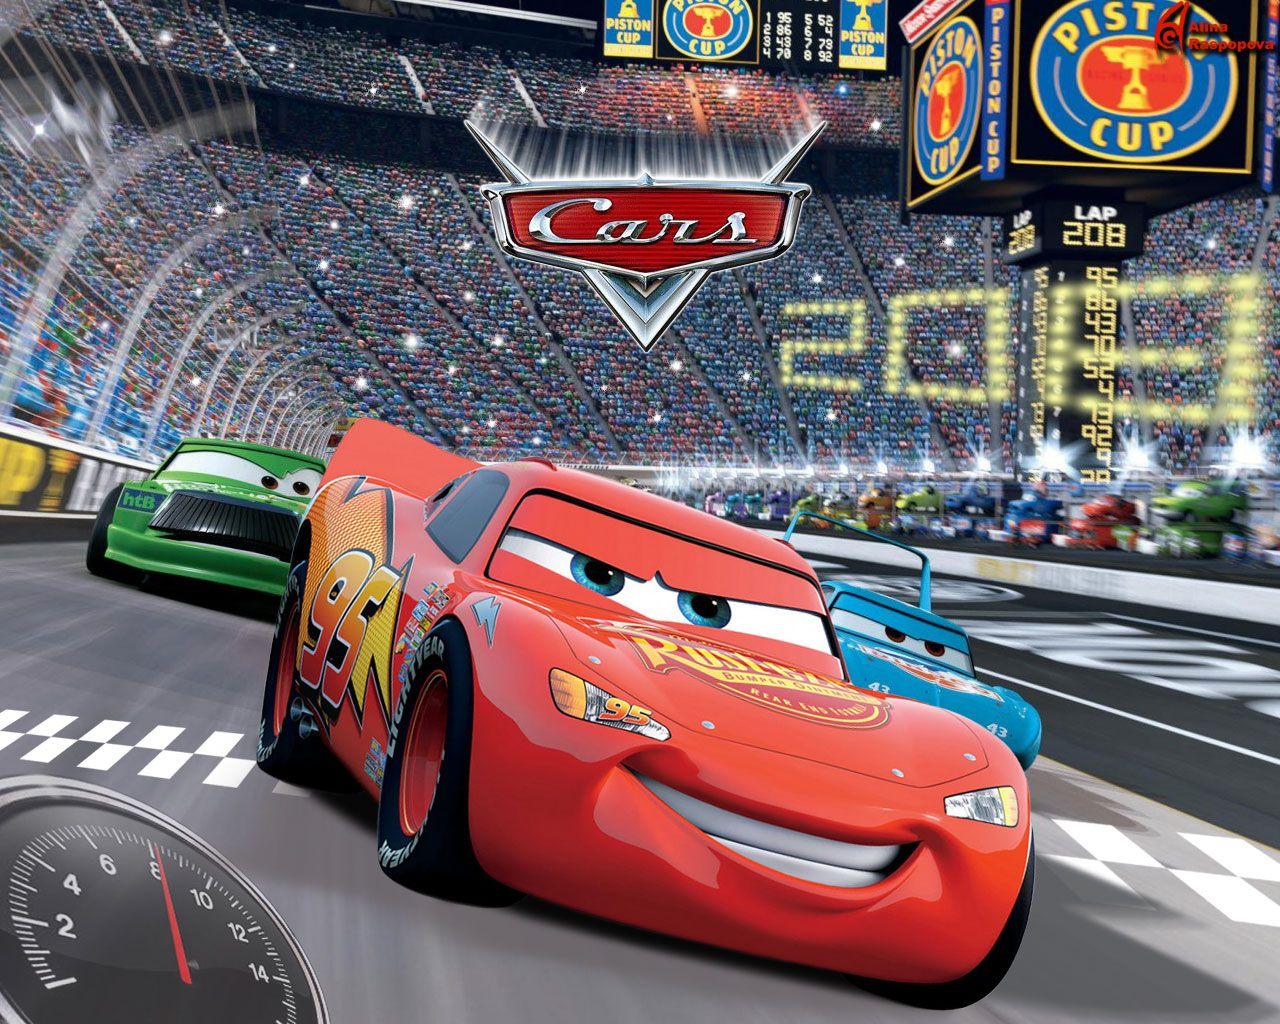 Cars 3 2017 Phone Wallpaper Moviemania Disney Cars Wallpaper Cars Movie Pixar Cars